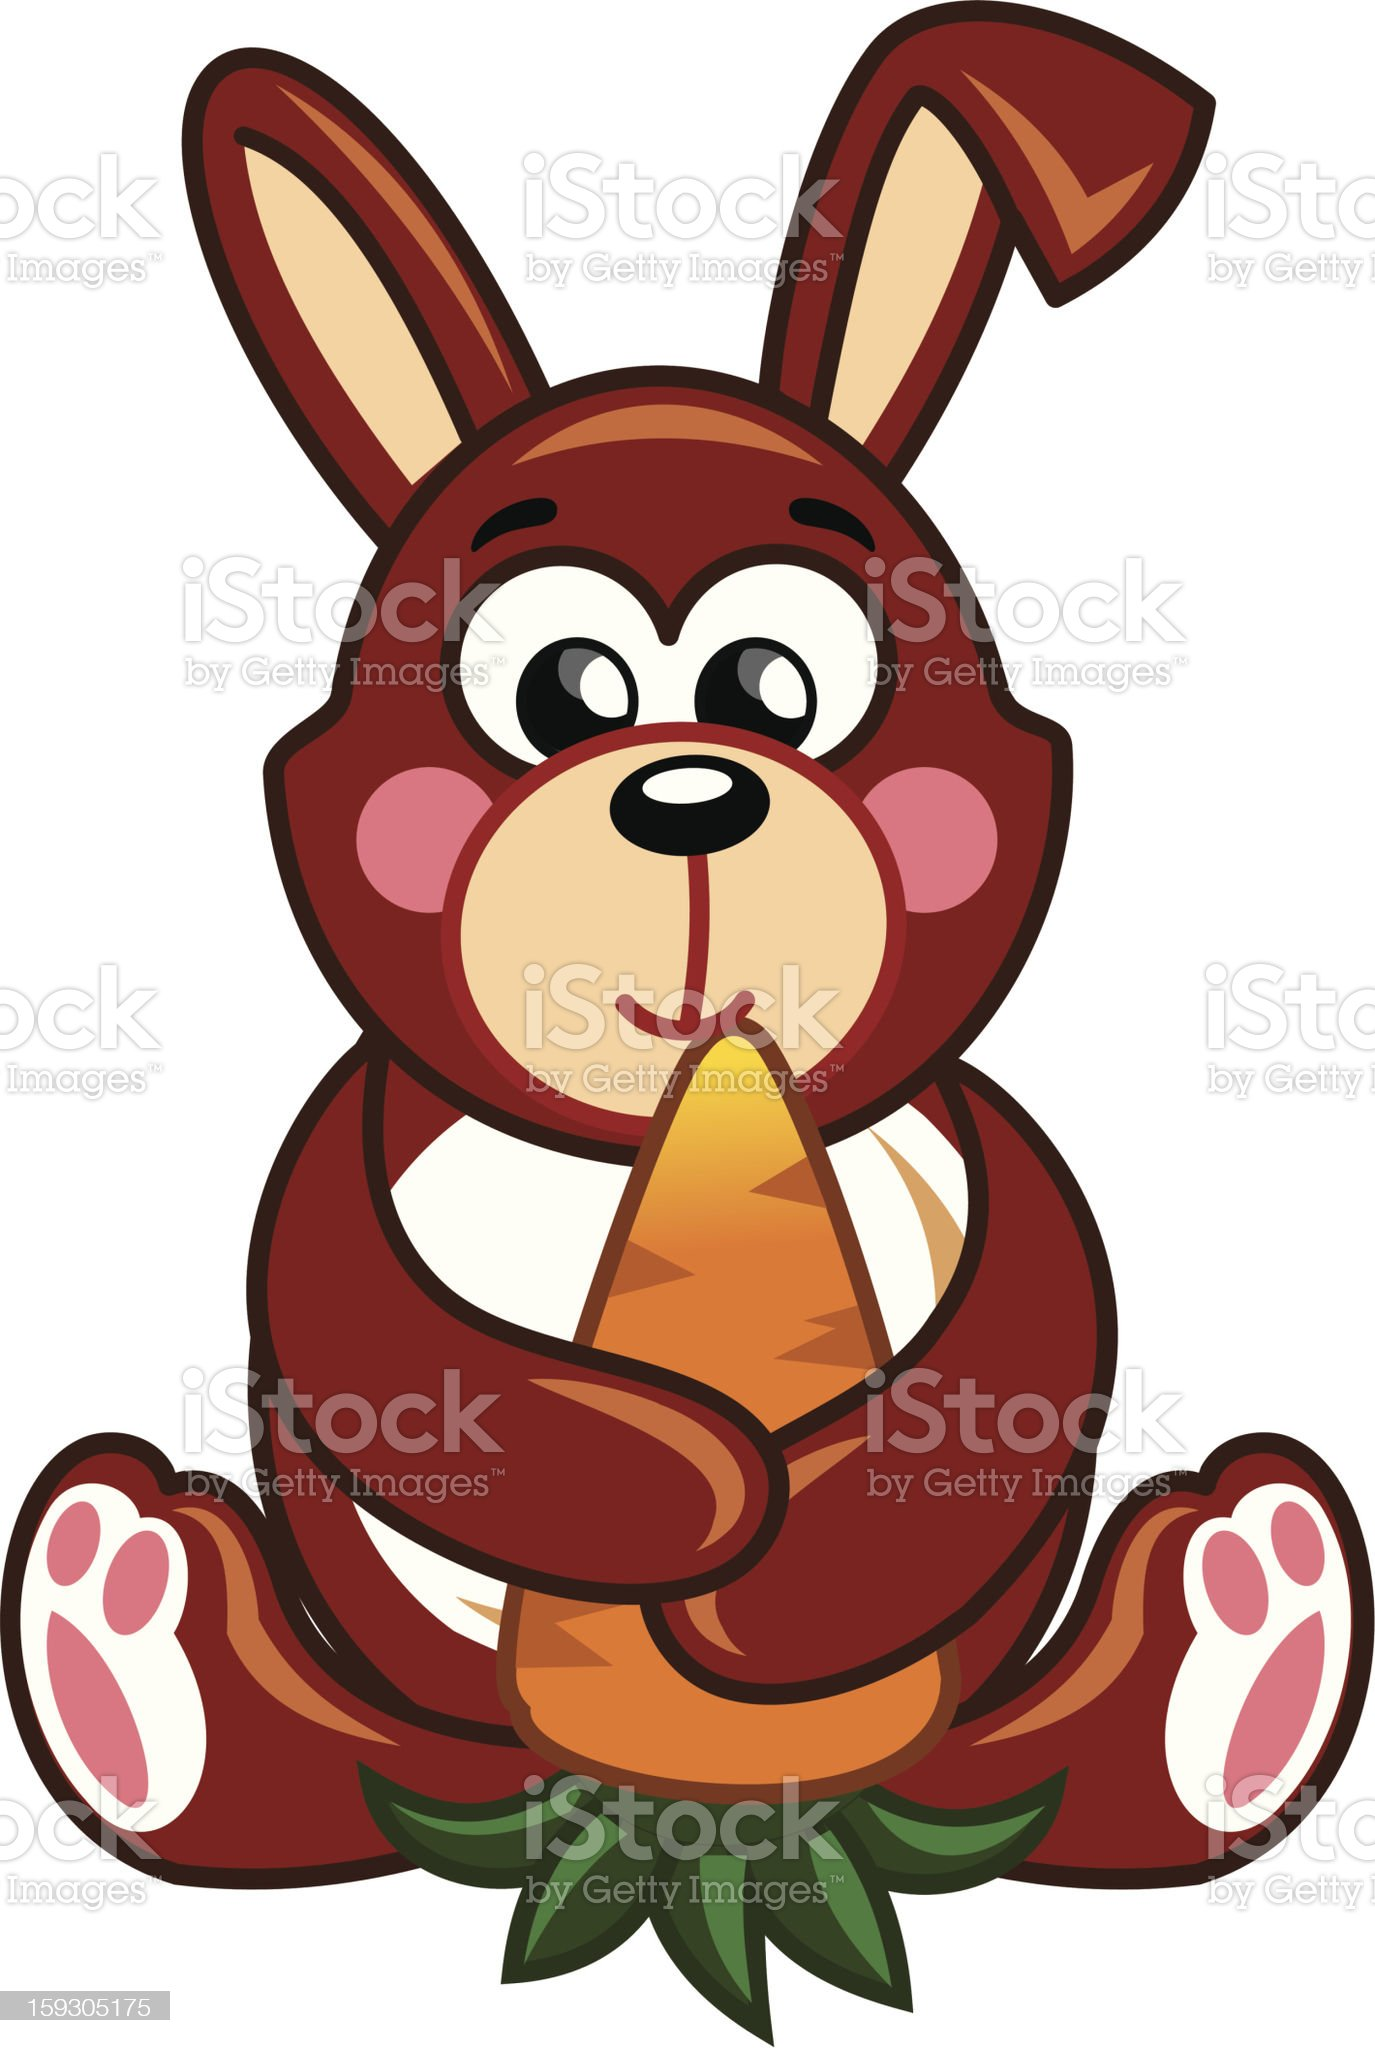 rabbit royalty-free stock vector art